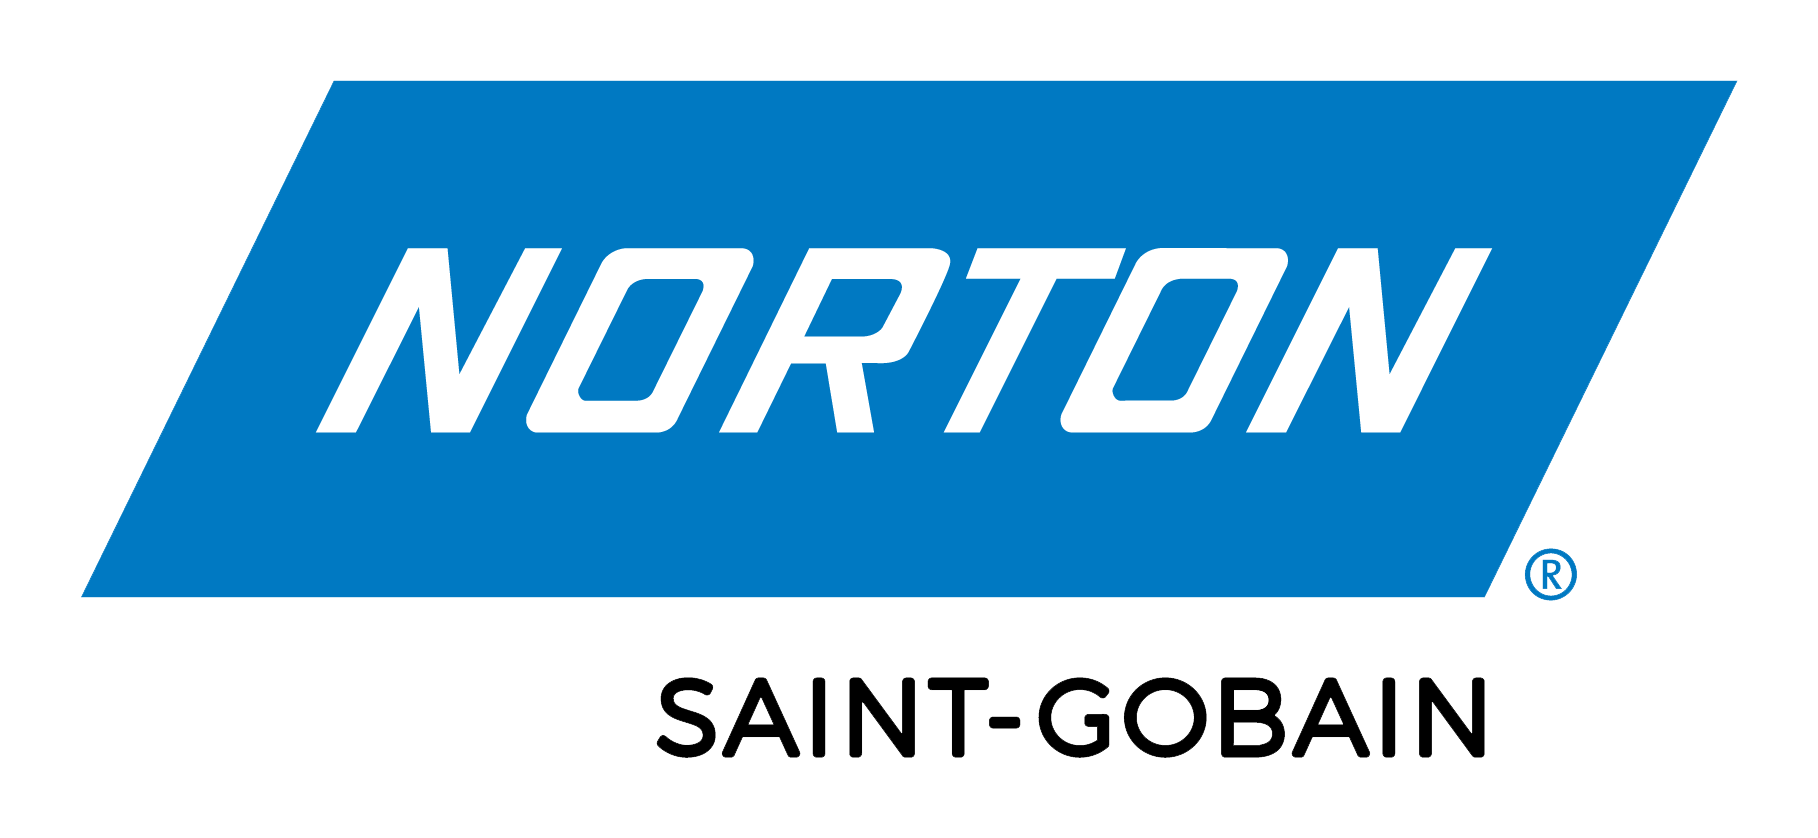 SG_Norton_logo_rgb_8